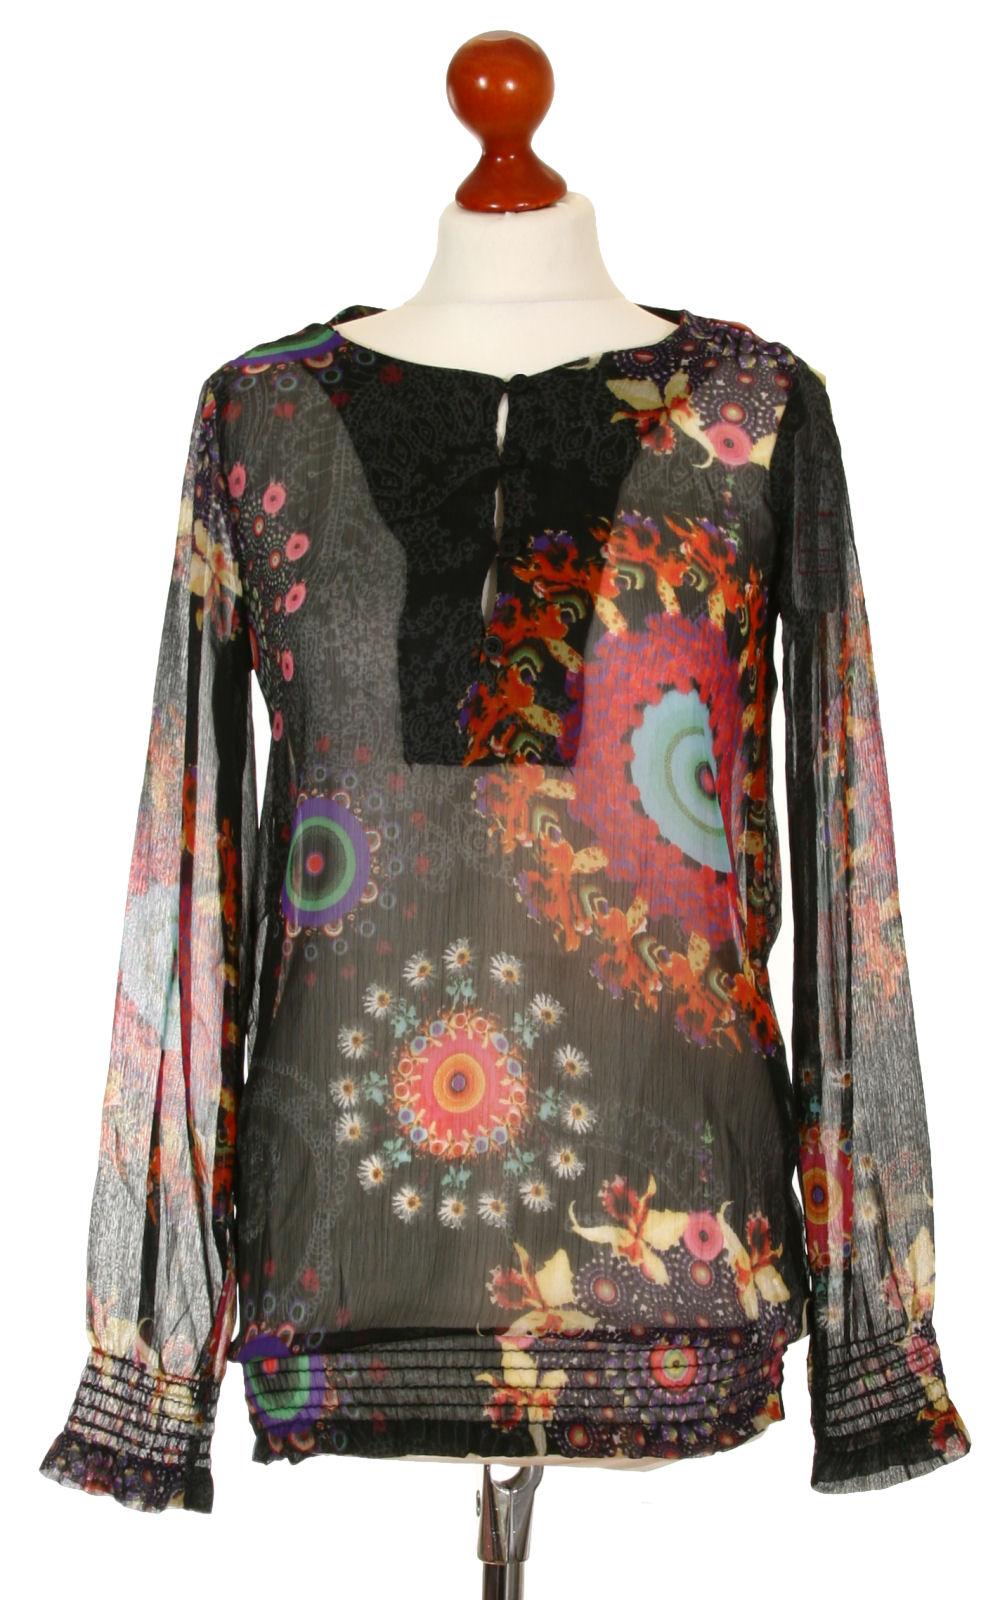 6f3b824cc7e7 Outlet ruha | Női Blúz hosszú, Desigual, Méret: S, Outlet | http ...